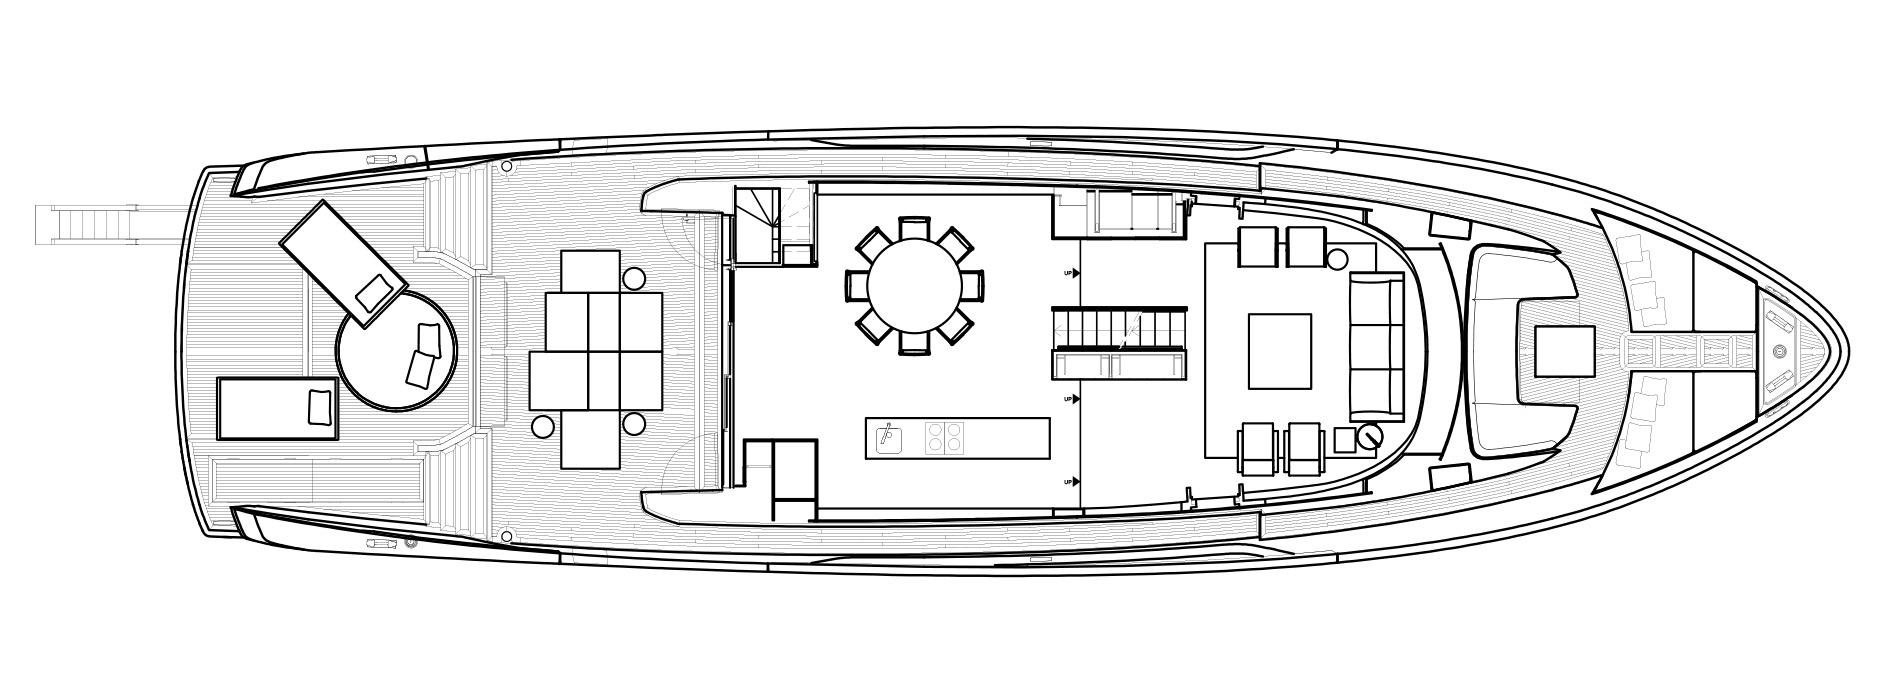 Sanlorenzo Yachts SX88 Главная палуба версия Lissoni